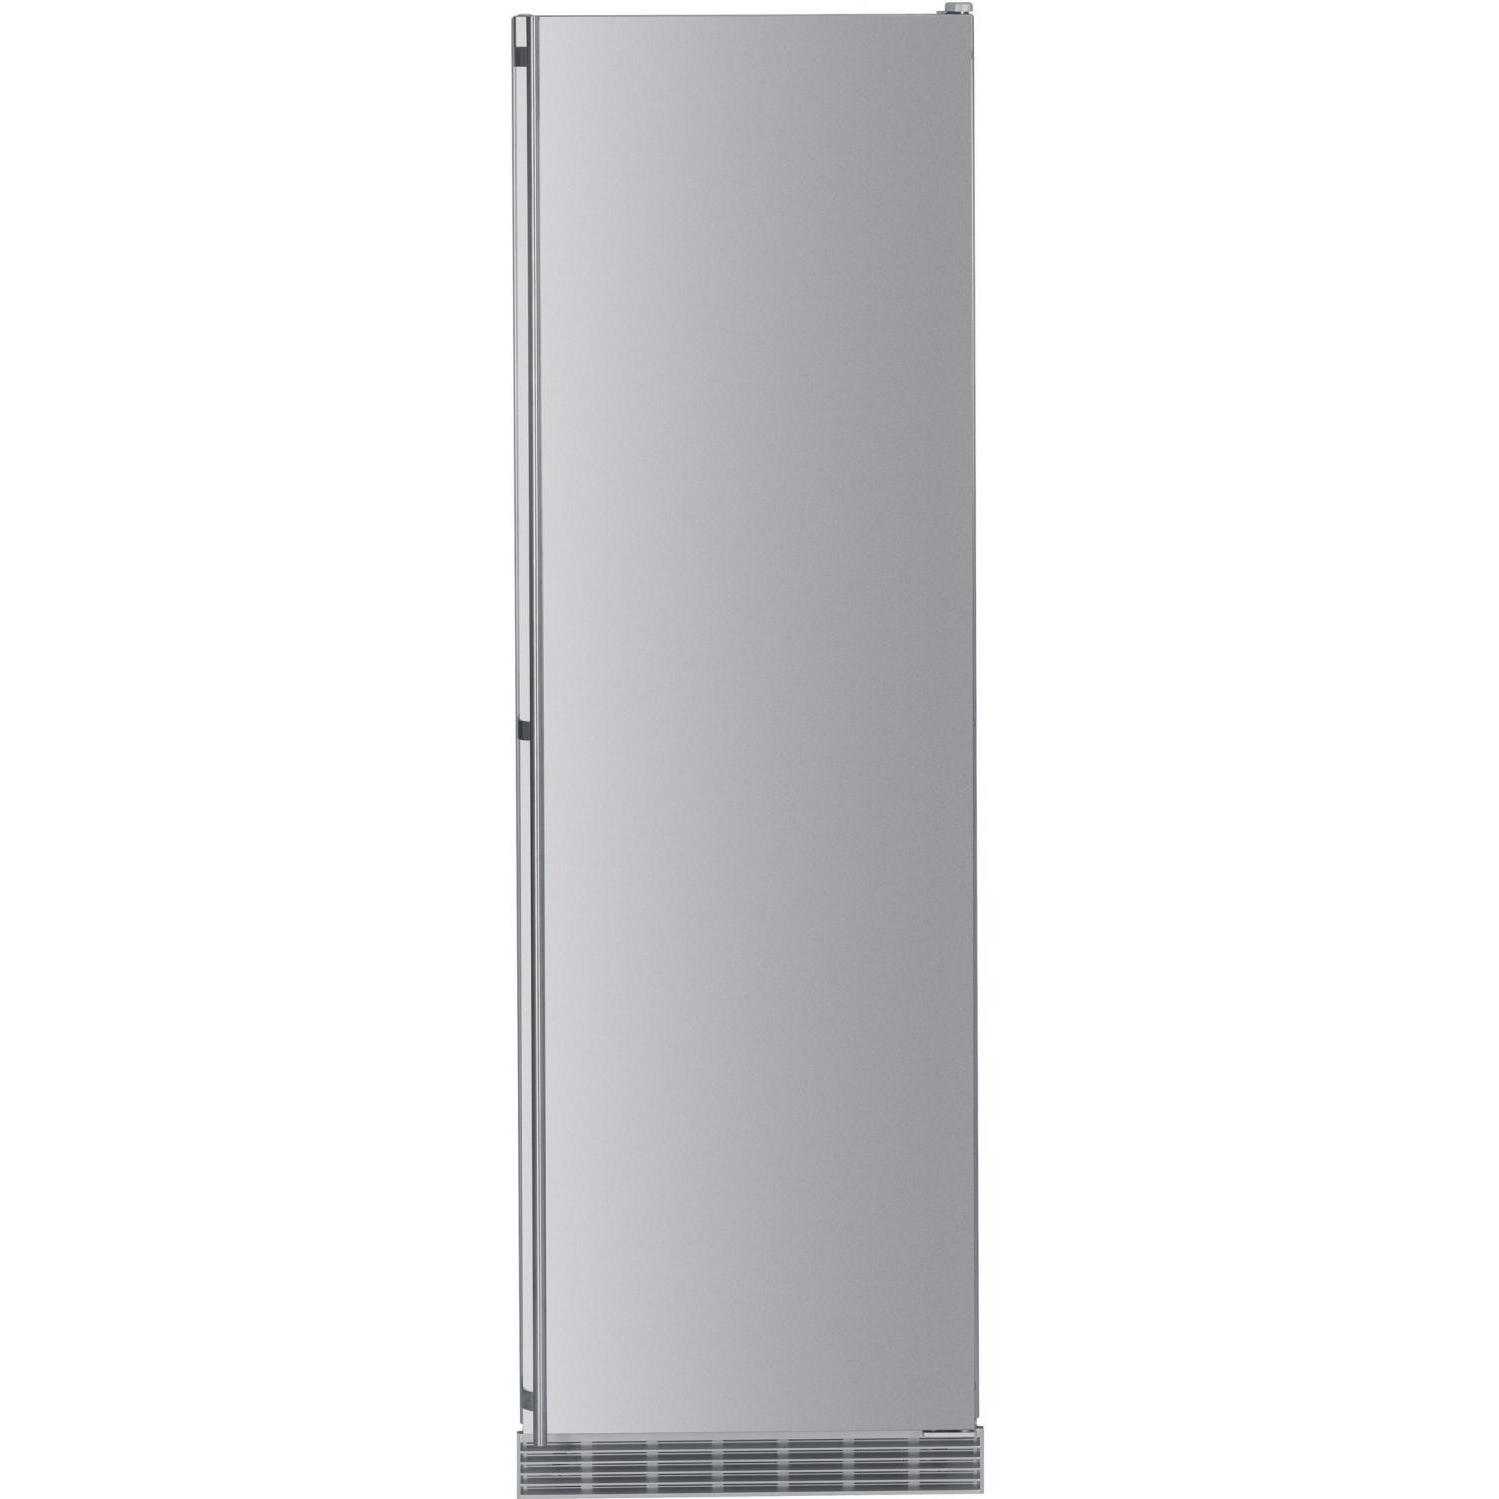 Liebherr RB-1410 11.9 Cu. Ft. Capacity Built-In Refrigerator - Stainless Steel